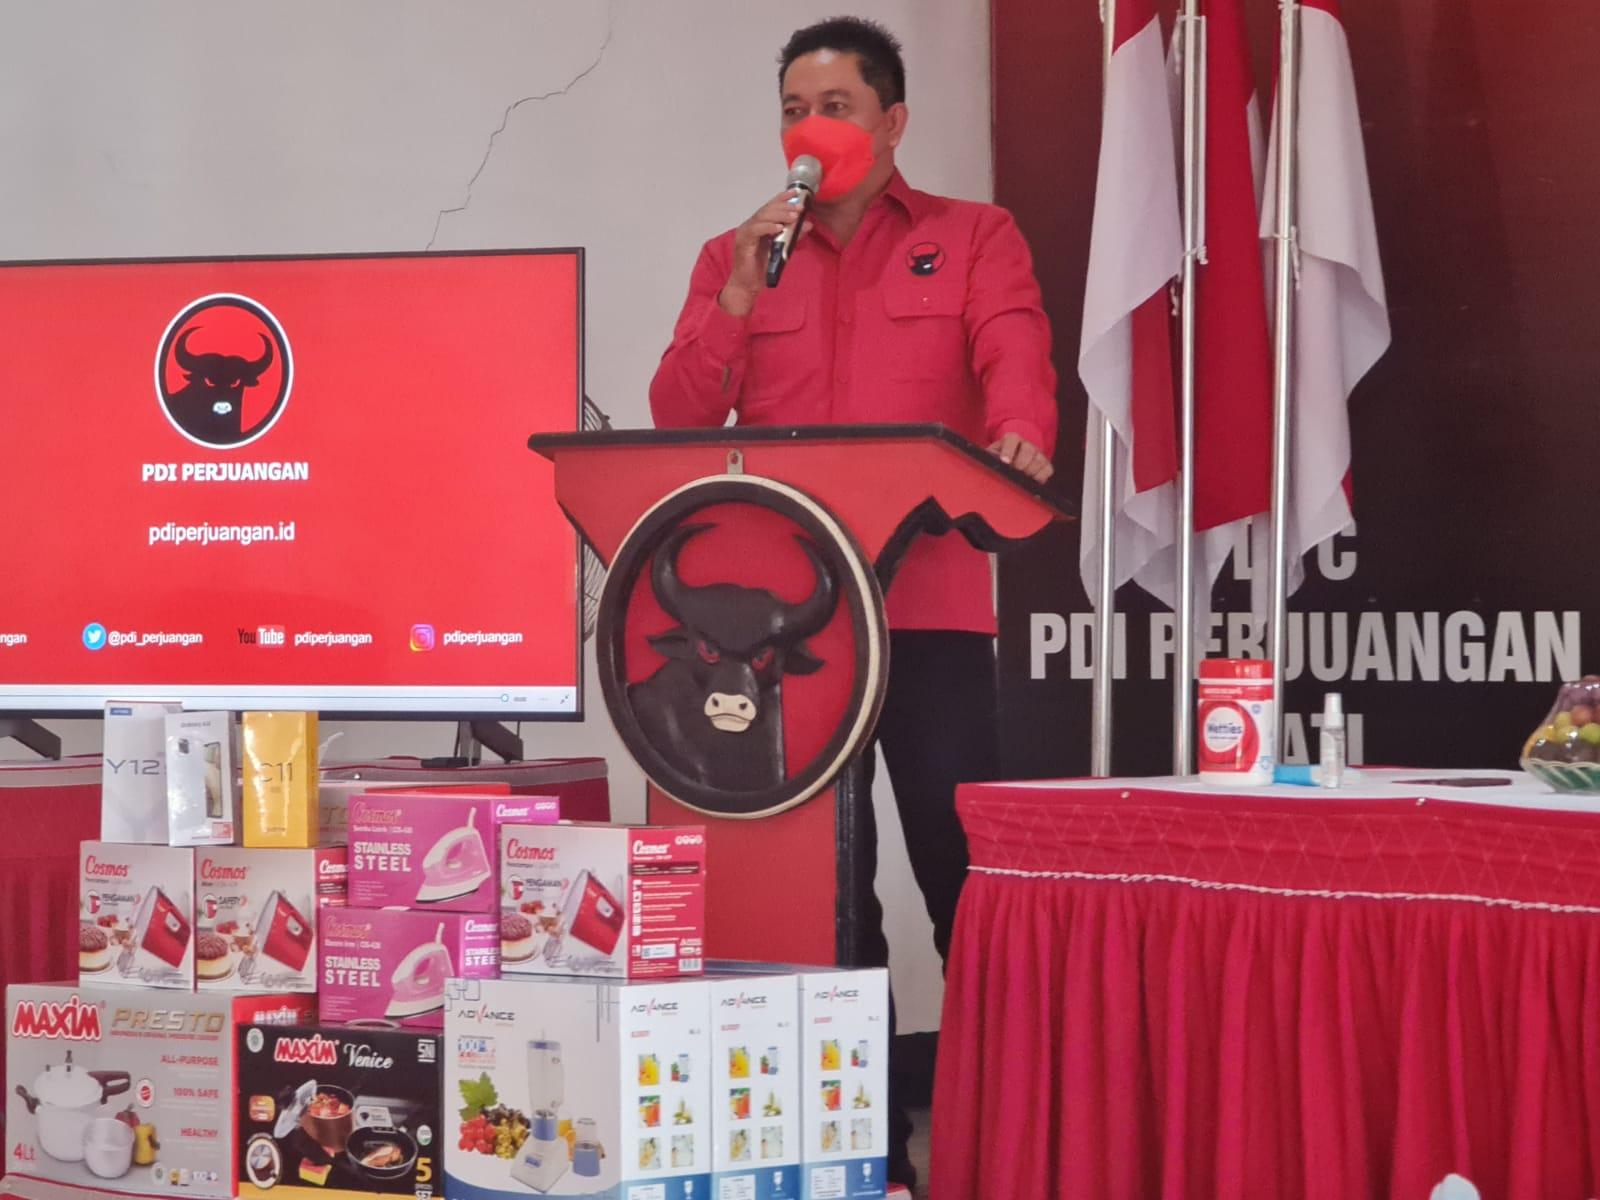 Ketua DPC PDIP Pati Ali Badrudin saat memberikan arahan dalam acara pendidikan politik untuk perempuan di Kabupaten Pati. Lingkar News Network/Lingkar.co